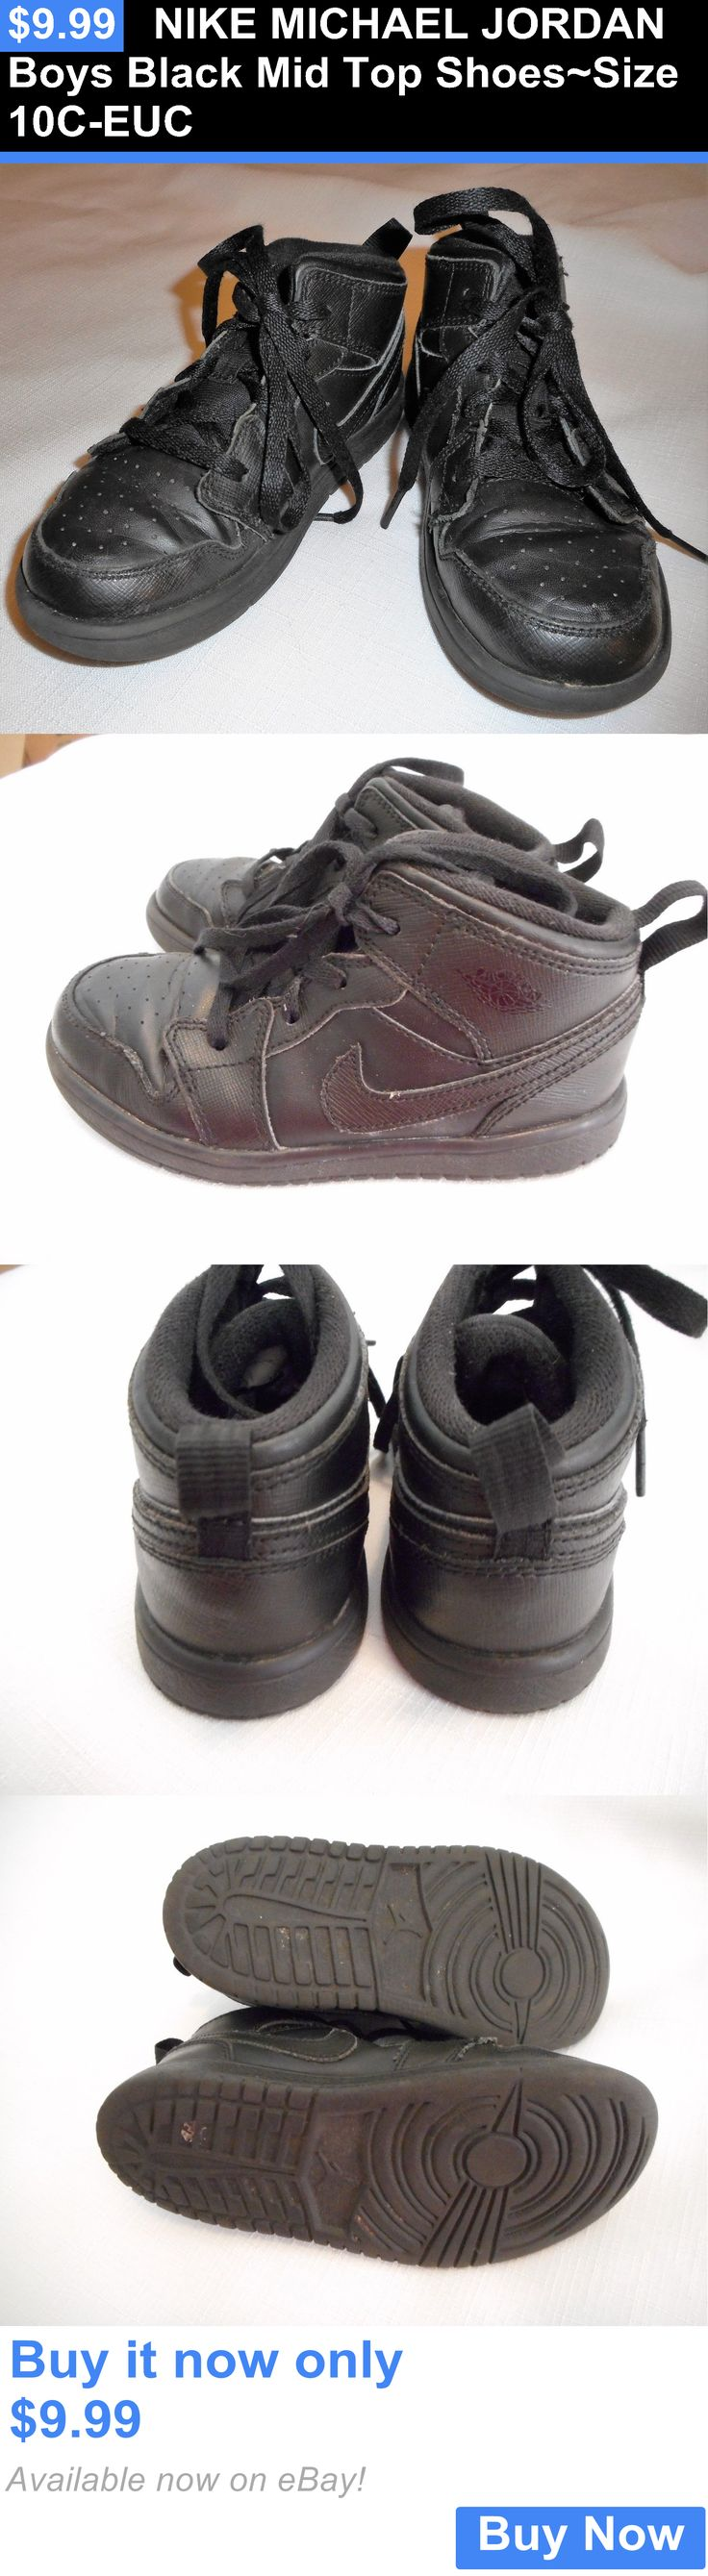 Michael Jordan Baby Clothing: Nike Michael Jordan Boys Black Mid Top Shoes~Size 10C-Euc BUY IT NOW ONLY: $9.99